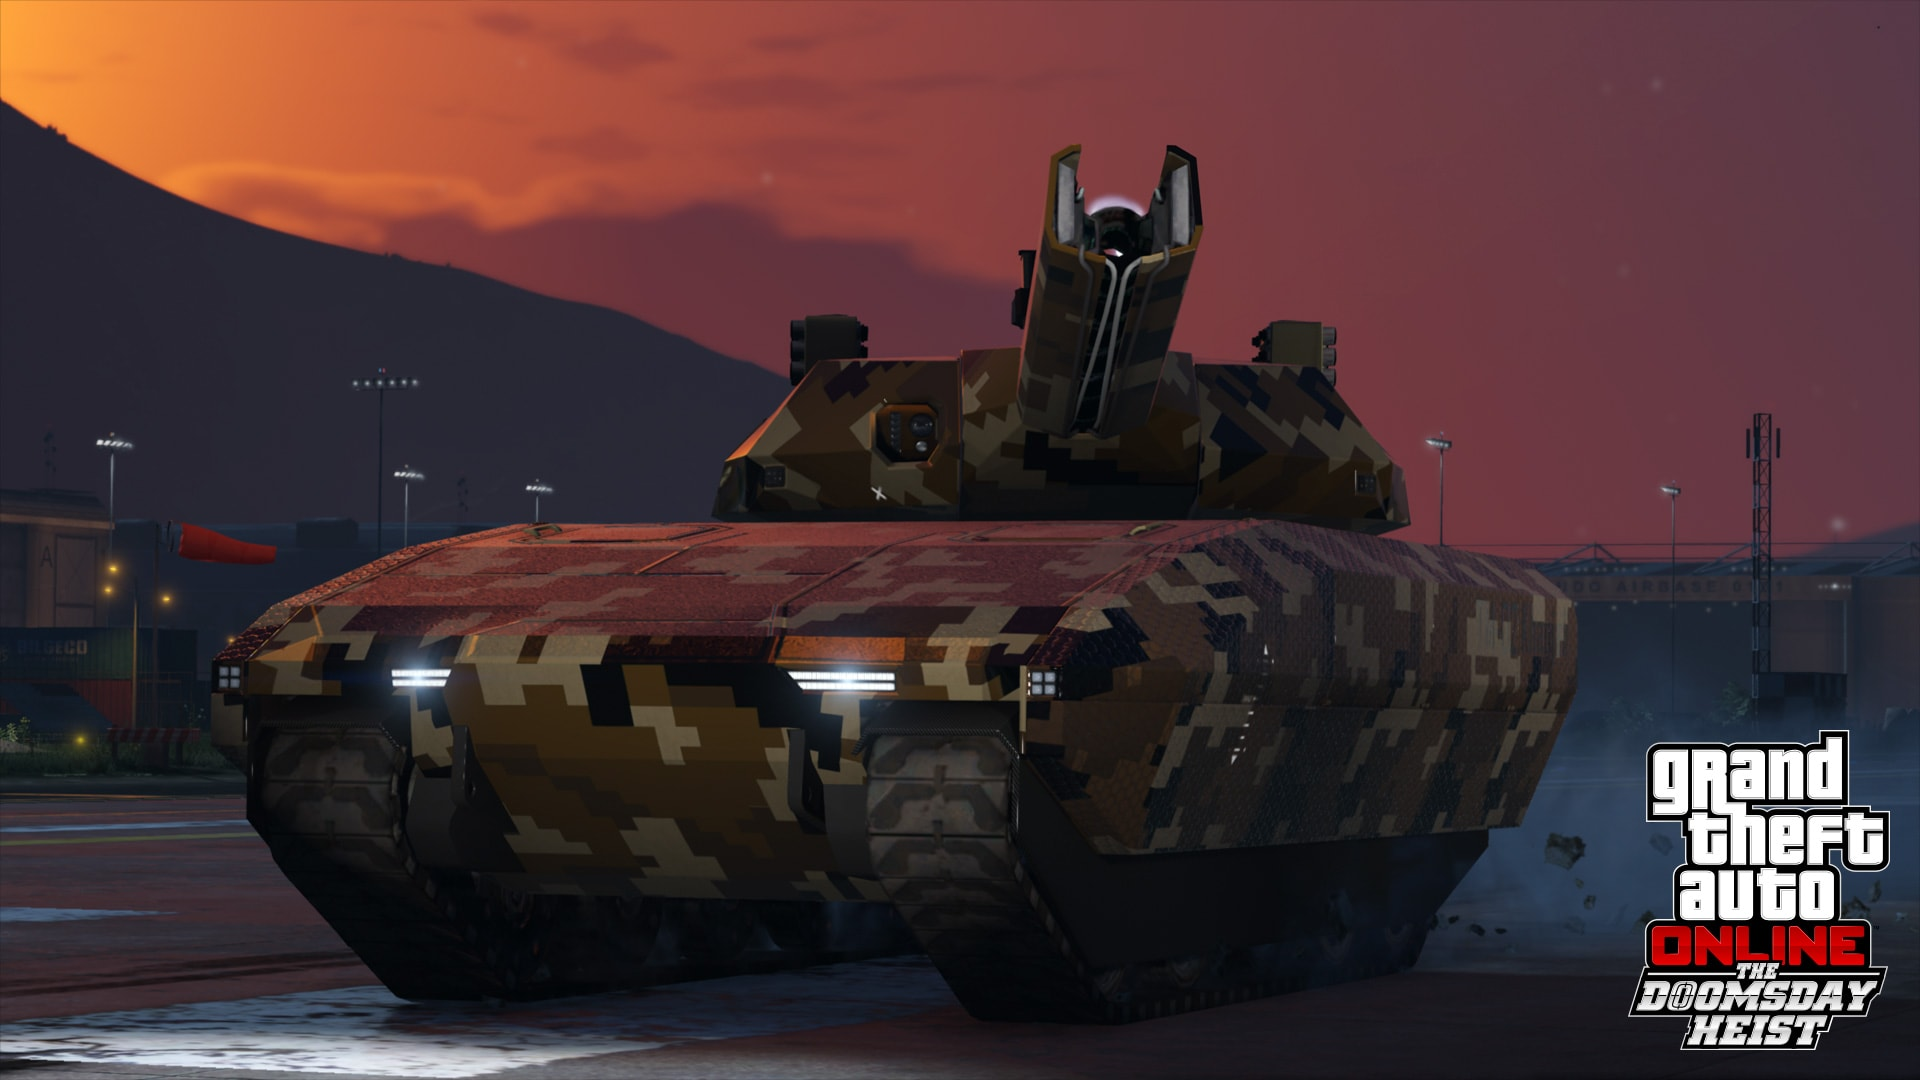 Grand Theft Auto V: Premium Online Edition (PC) - Rockstar Key - GLOBAL - 4